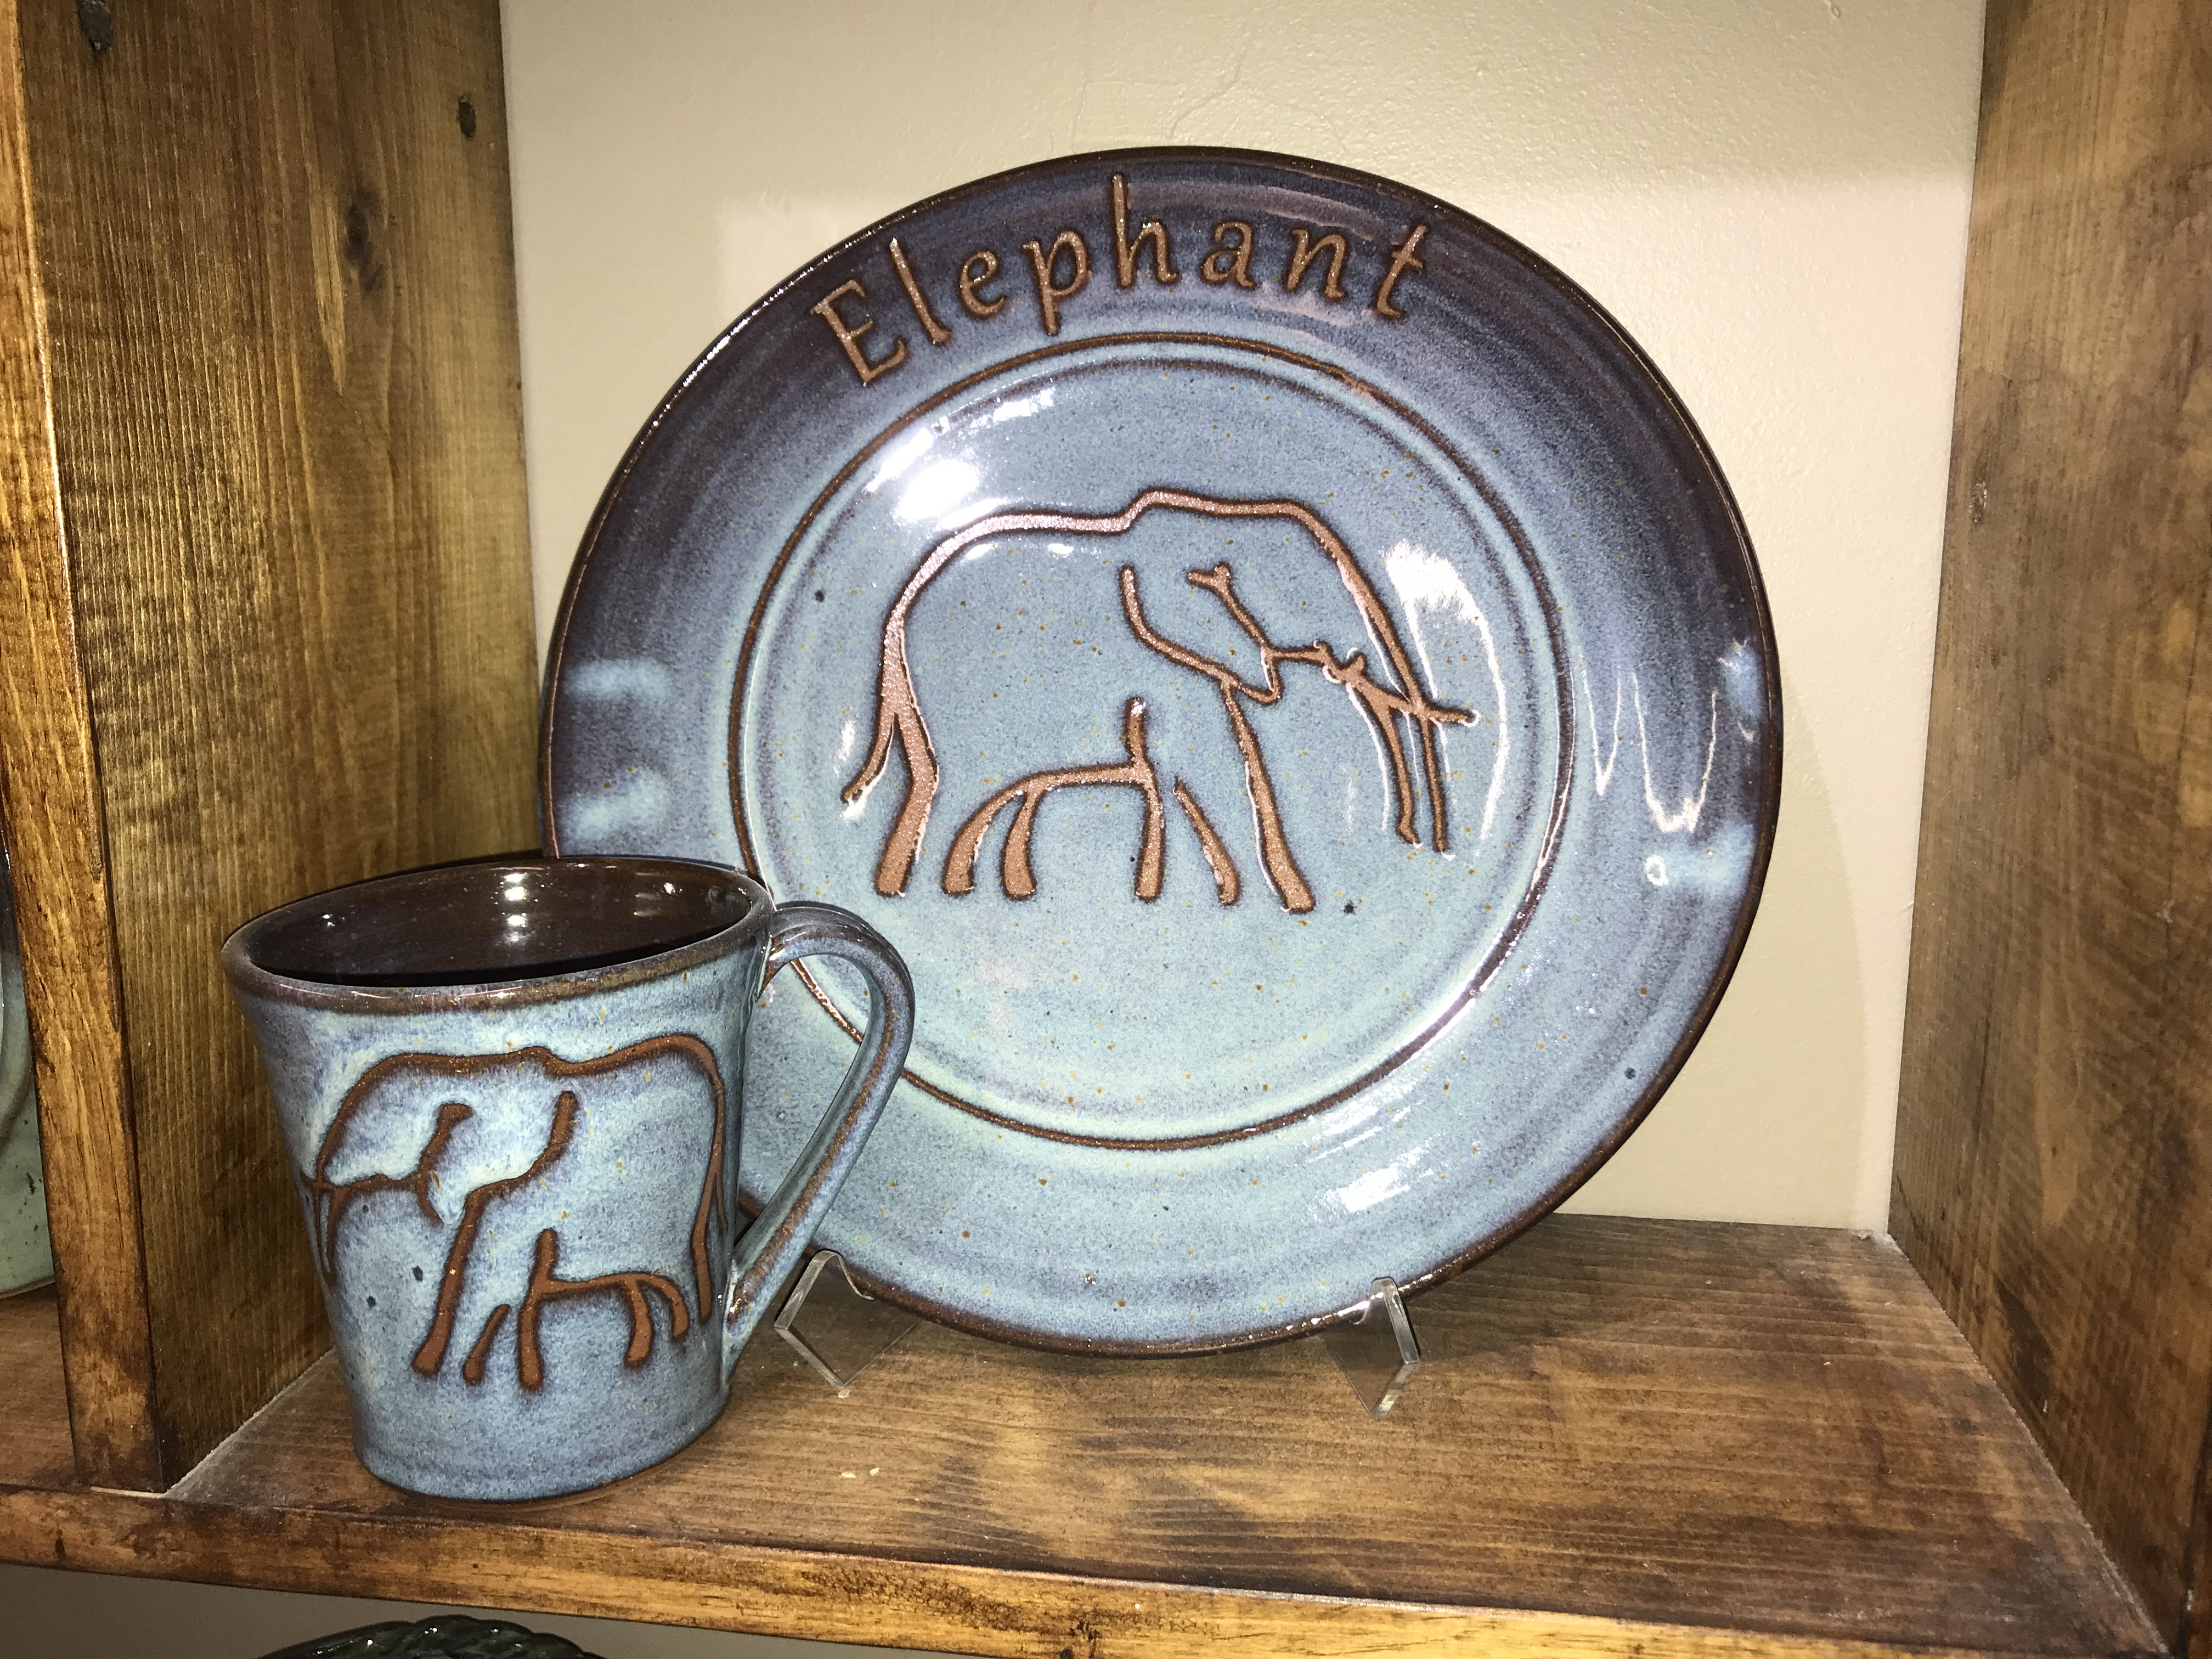 Elephants by Elizabeth Freeman